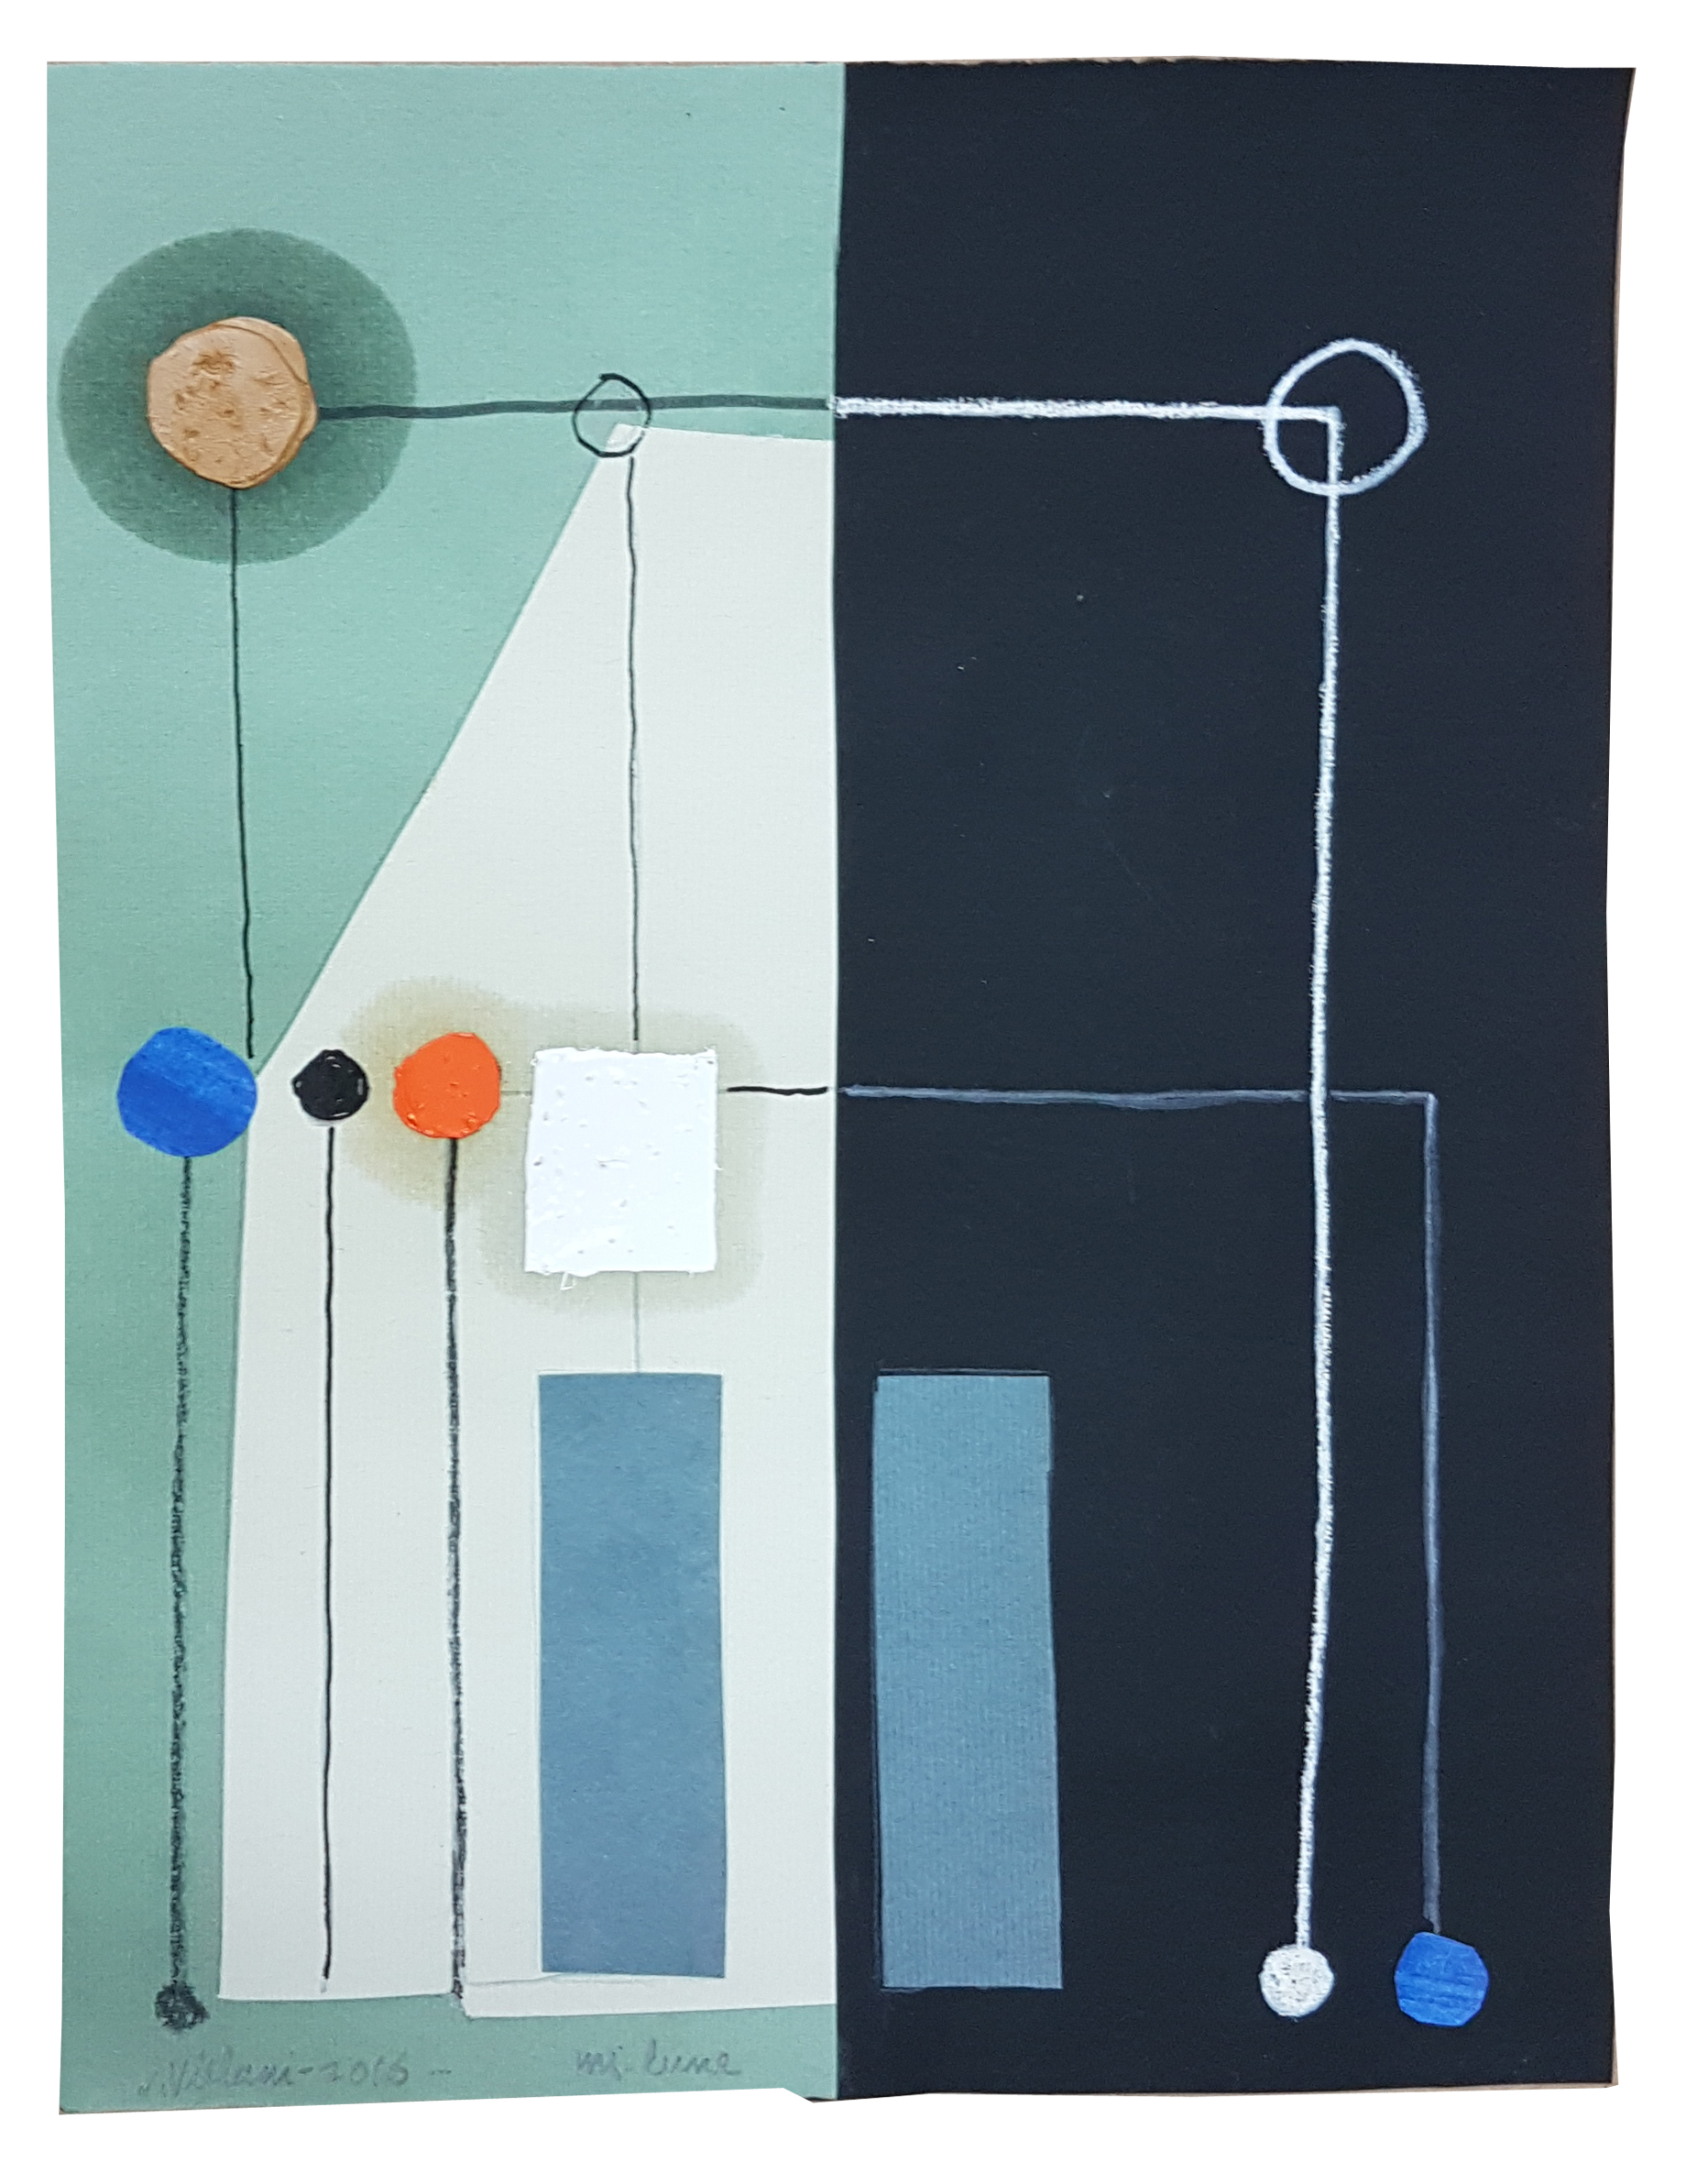 Júlio Villani, Mi Lune, óleo sobre papel, 31,5 x 24,5 cm, 2016.